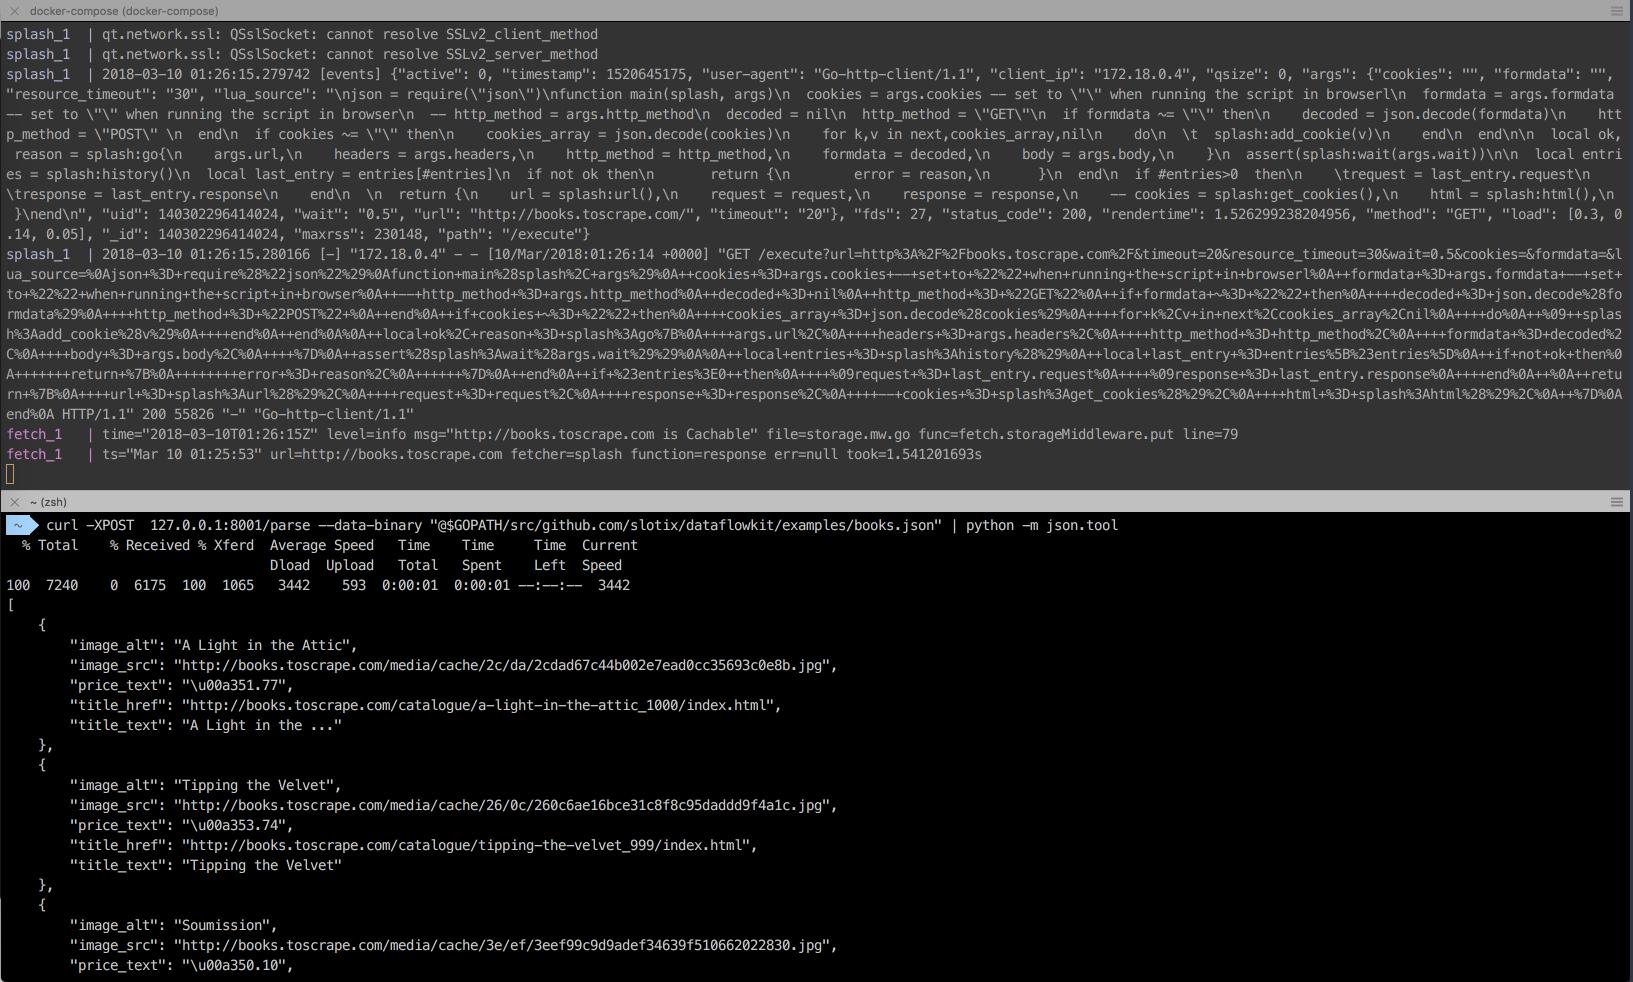 GitHub - slotix/dataflowkit: Extract structured data from